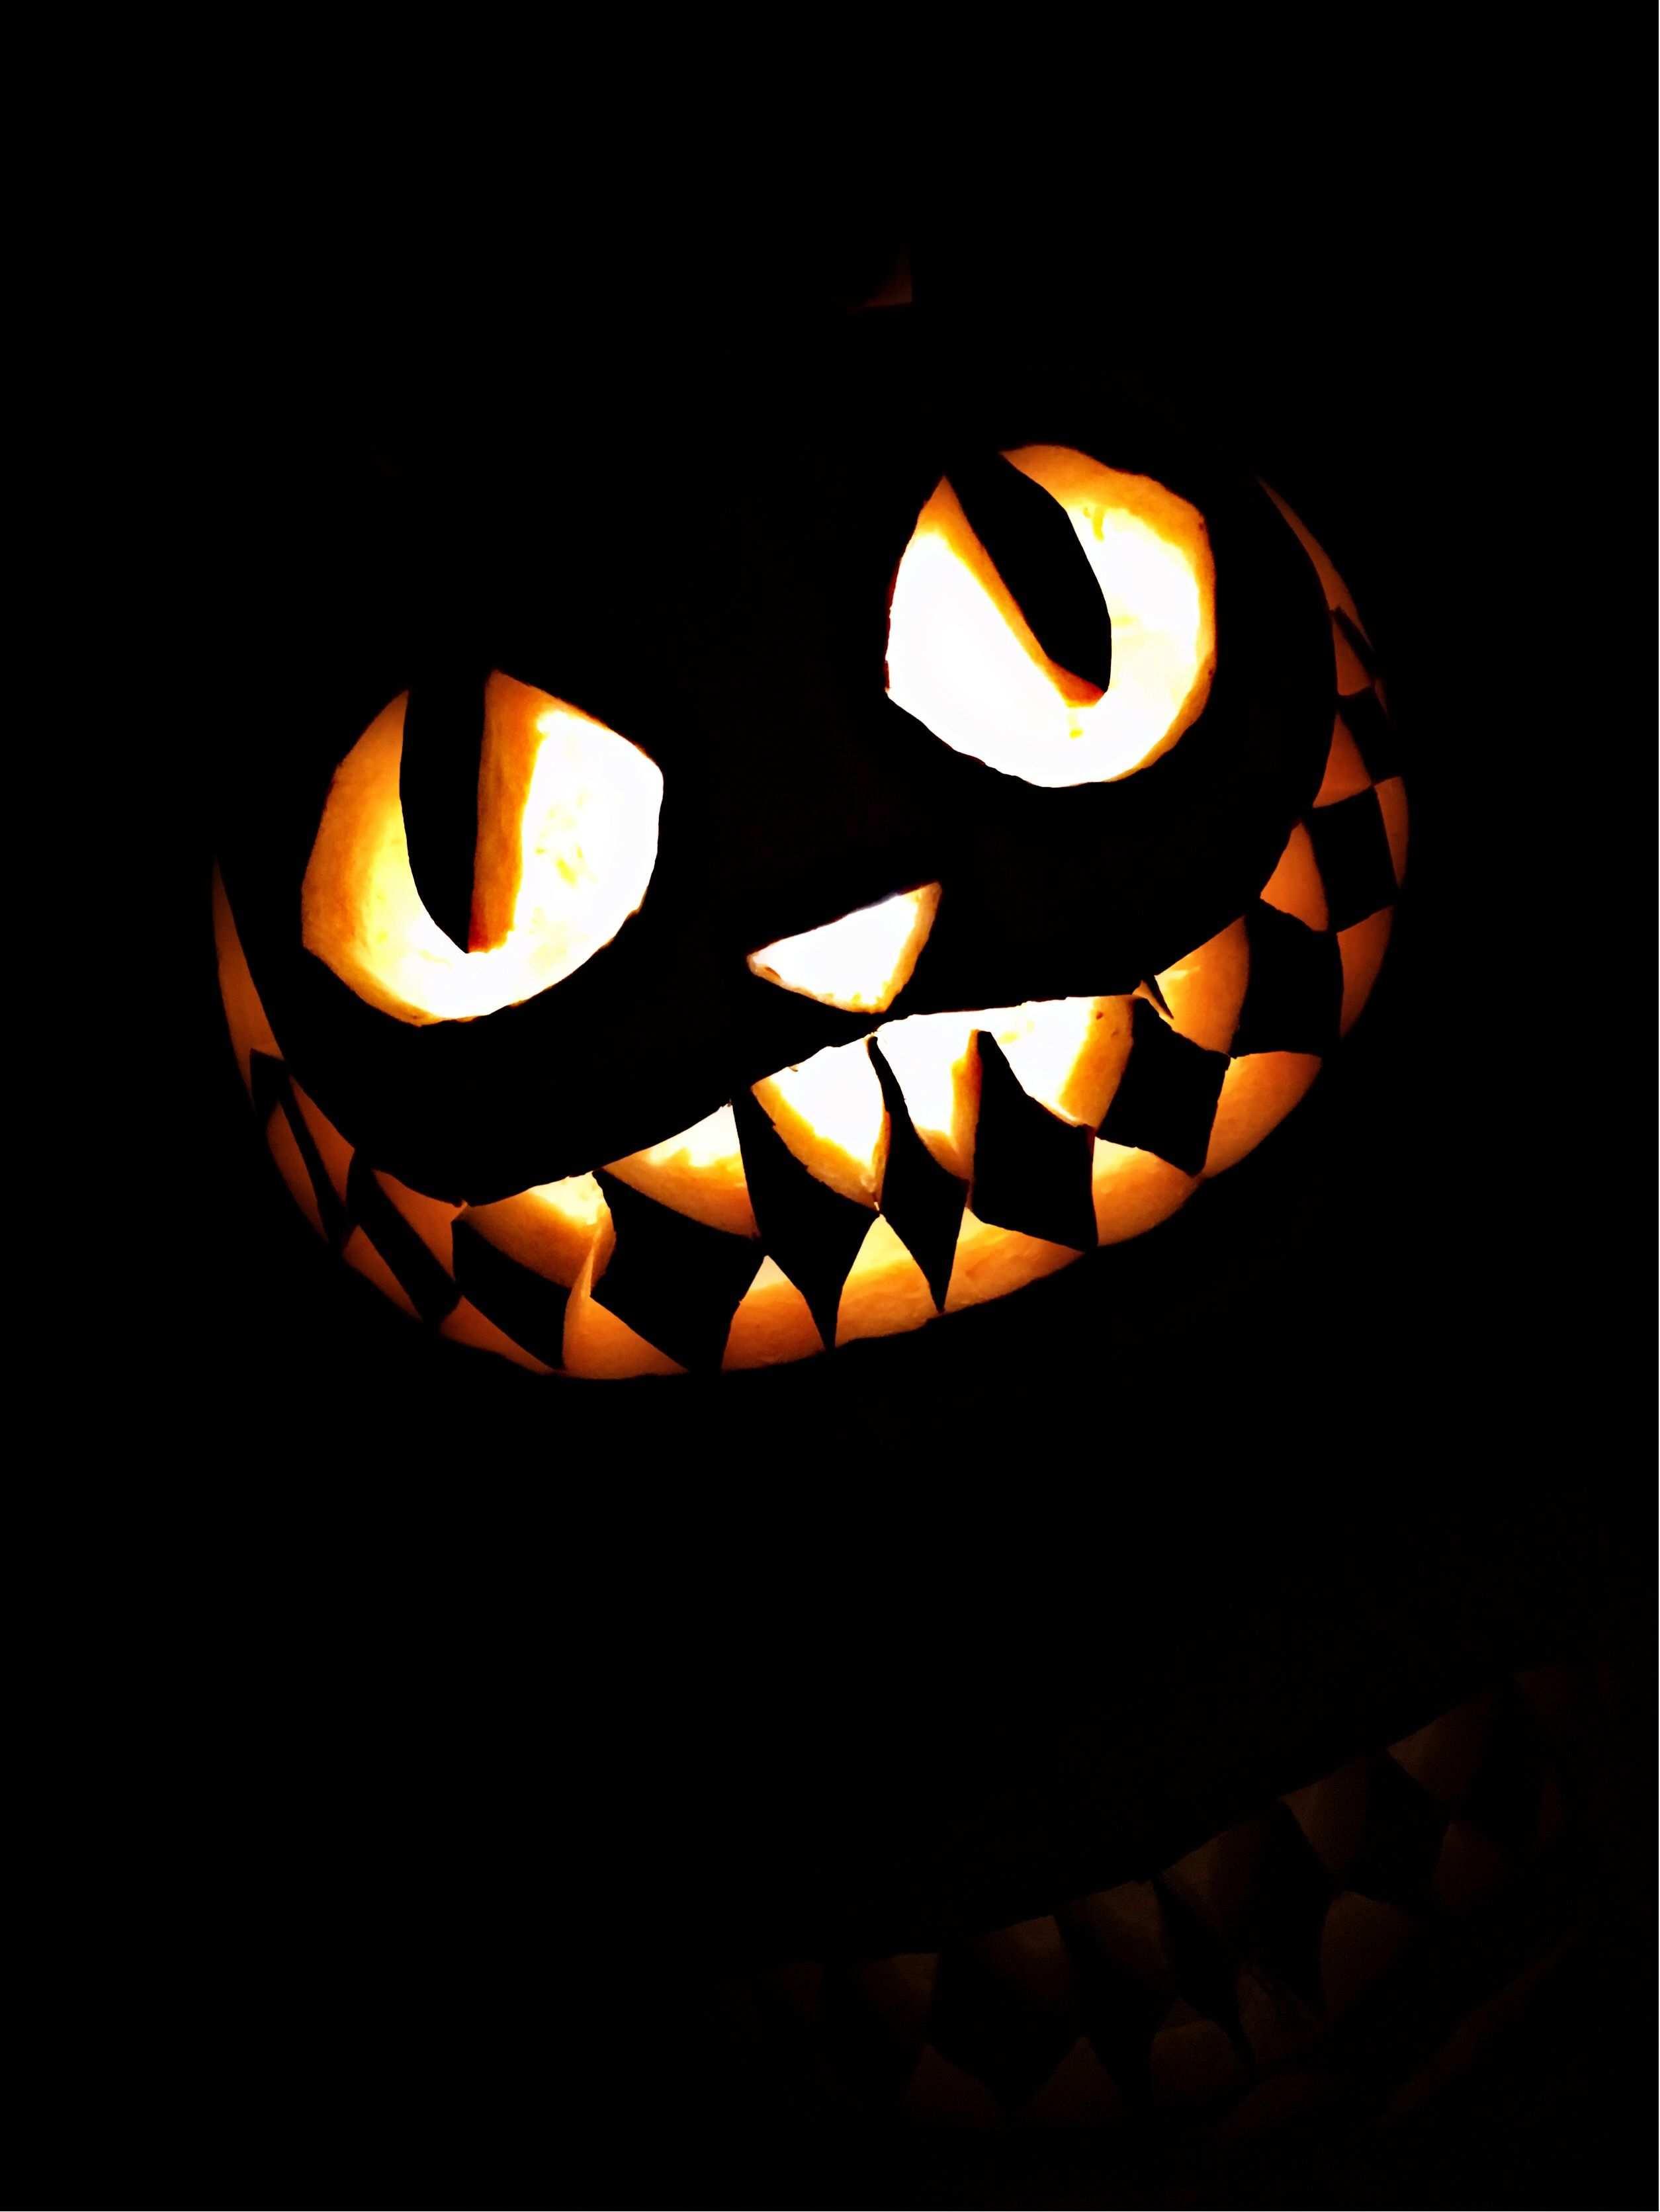 Happy Halloween Kurbisschnitzen Grinsekatze Halloween2017 Halloween Spooky Kurbis Schnitzen Grinsekatze Halloween Kurbis Schnitzen Kurbisschnitzereien